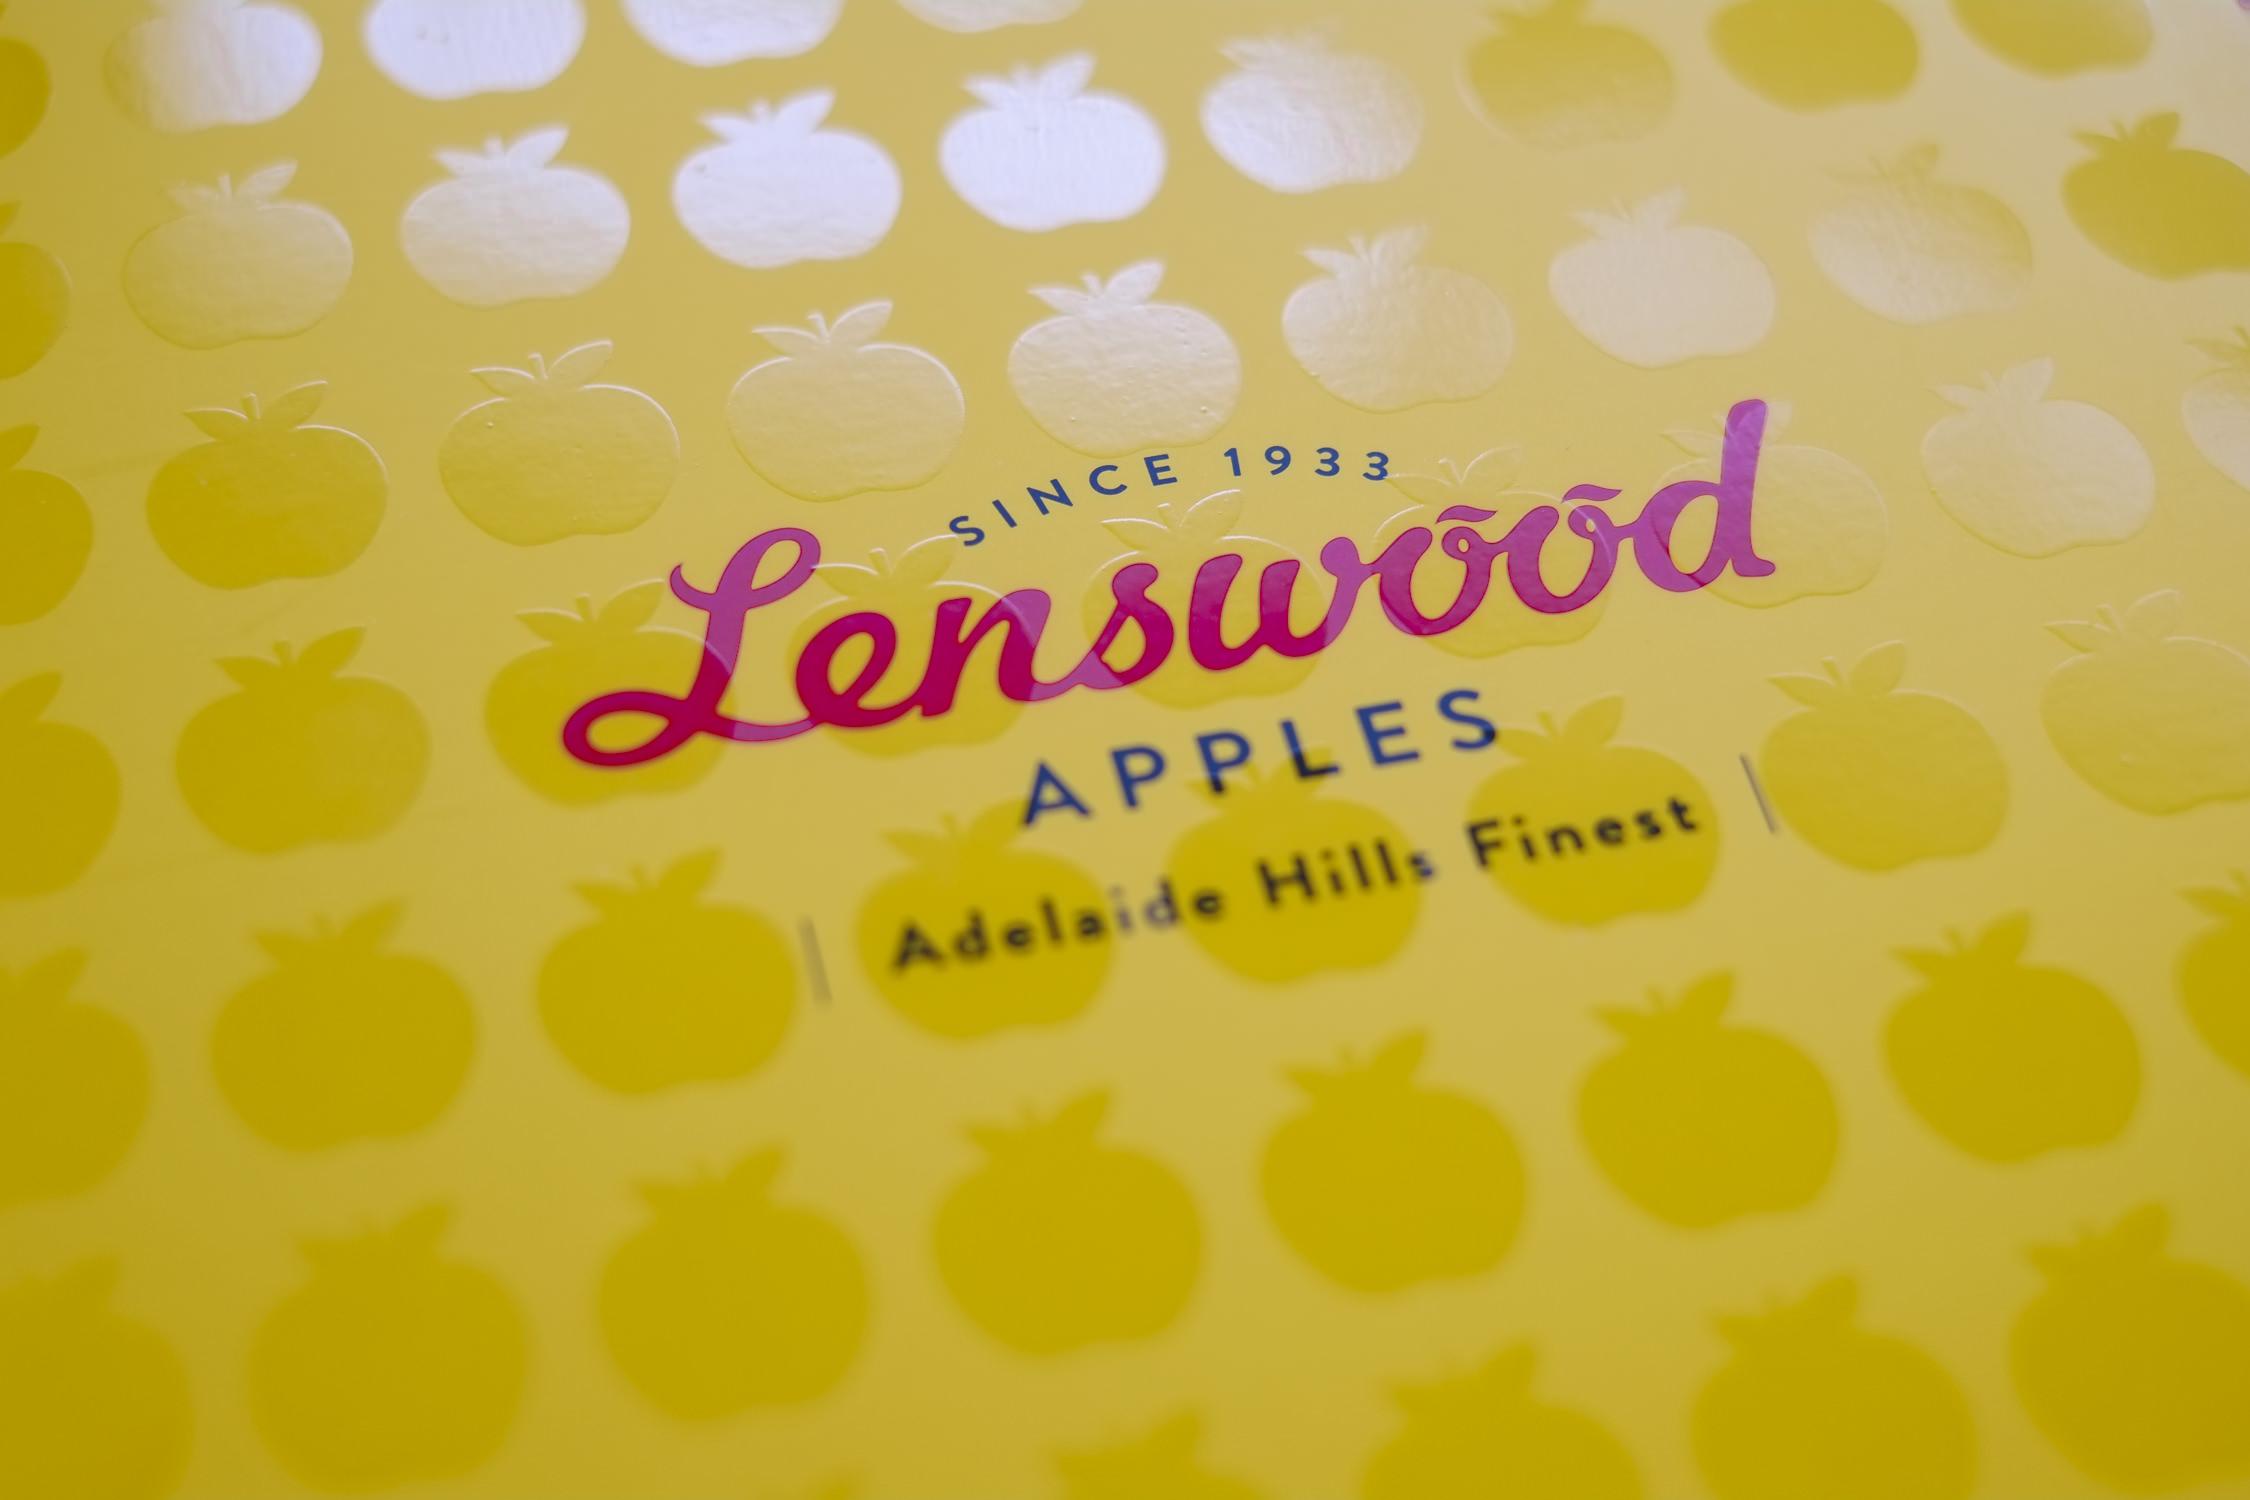 influx-lenswood1.jpg